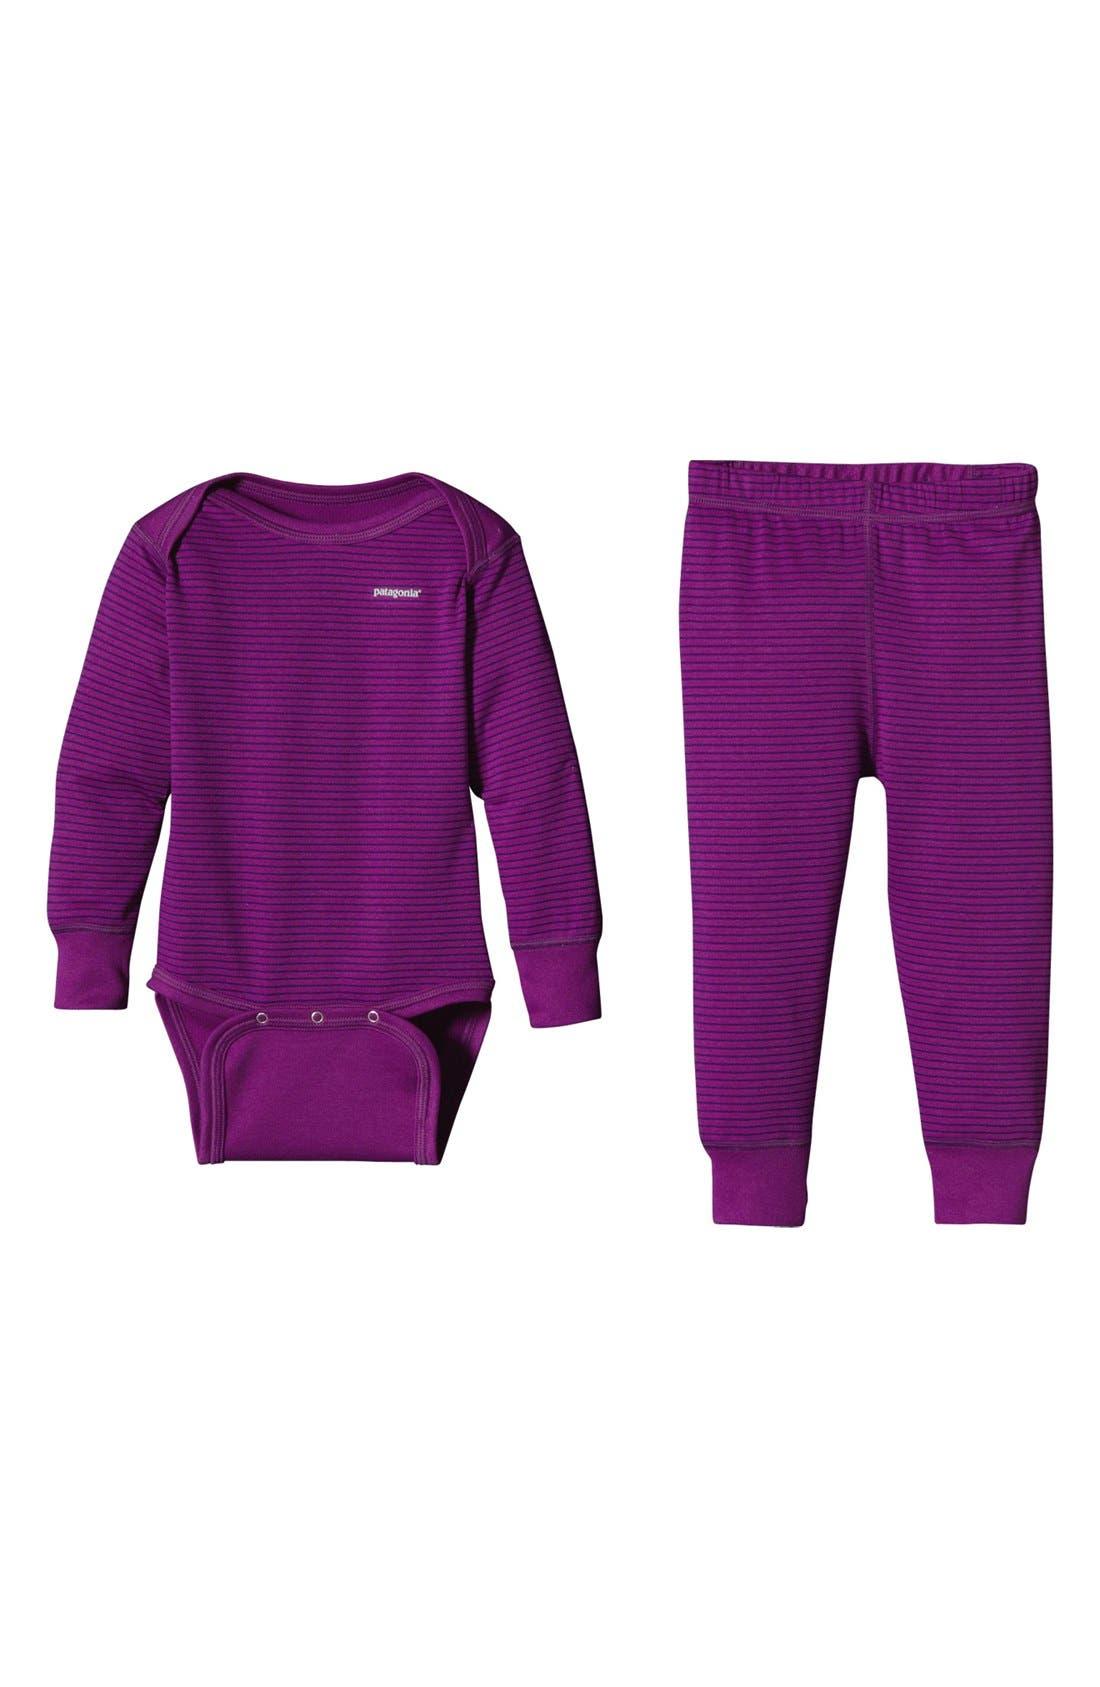 Main Image - Patagonia Bodysuit & Pants (Infant)